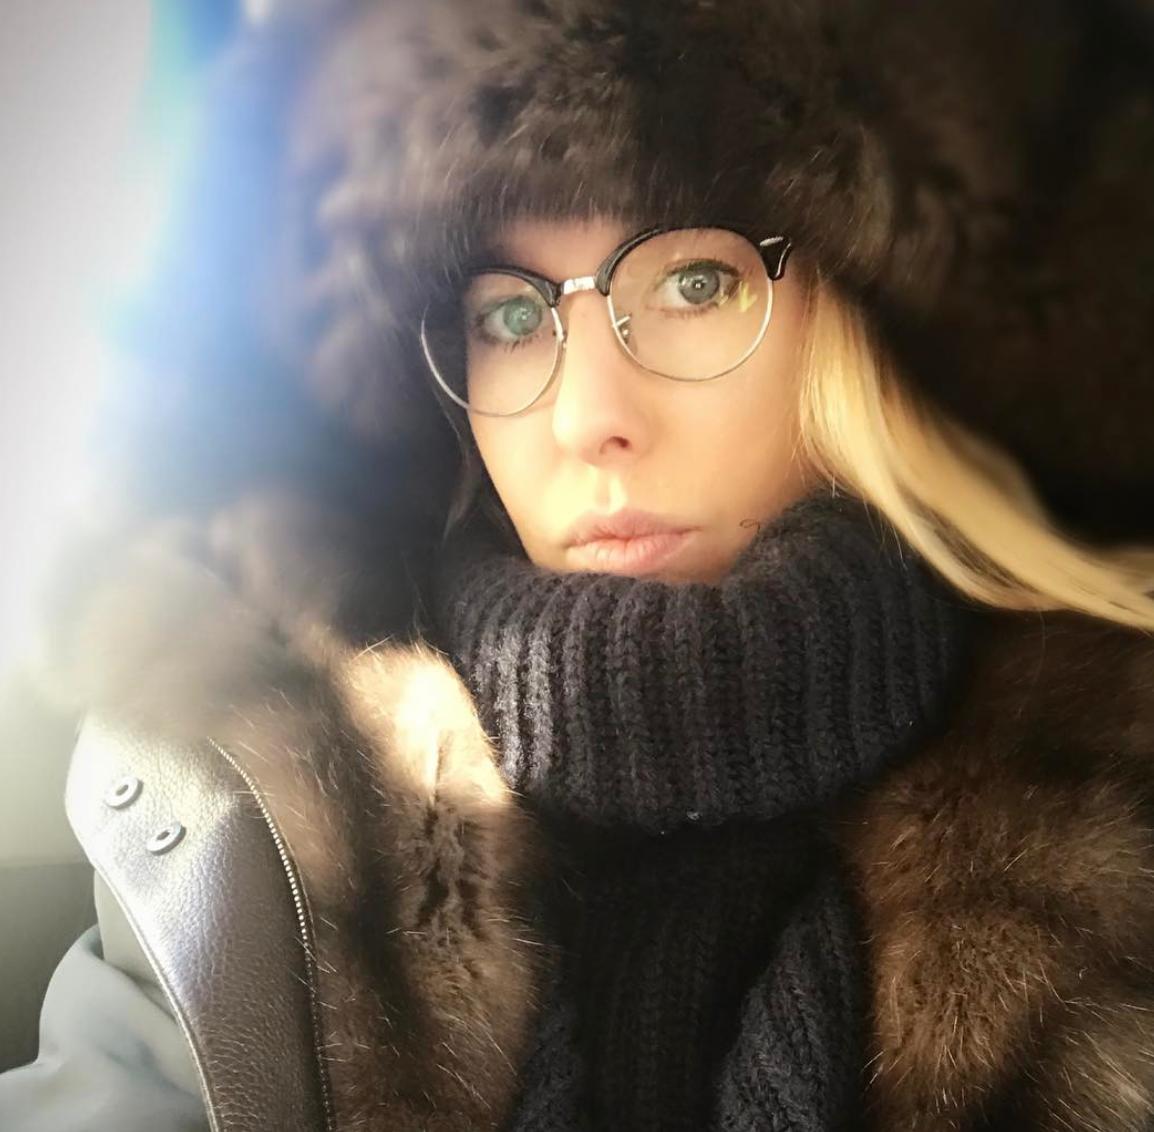 Соцсети неоценили внешний облик Ксении Собчак